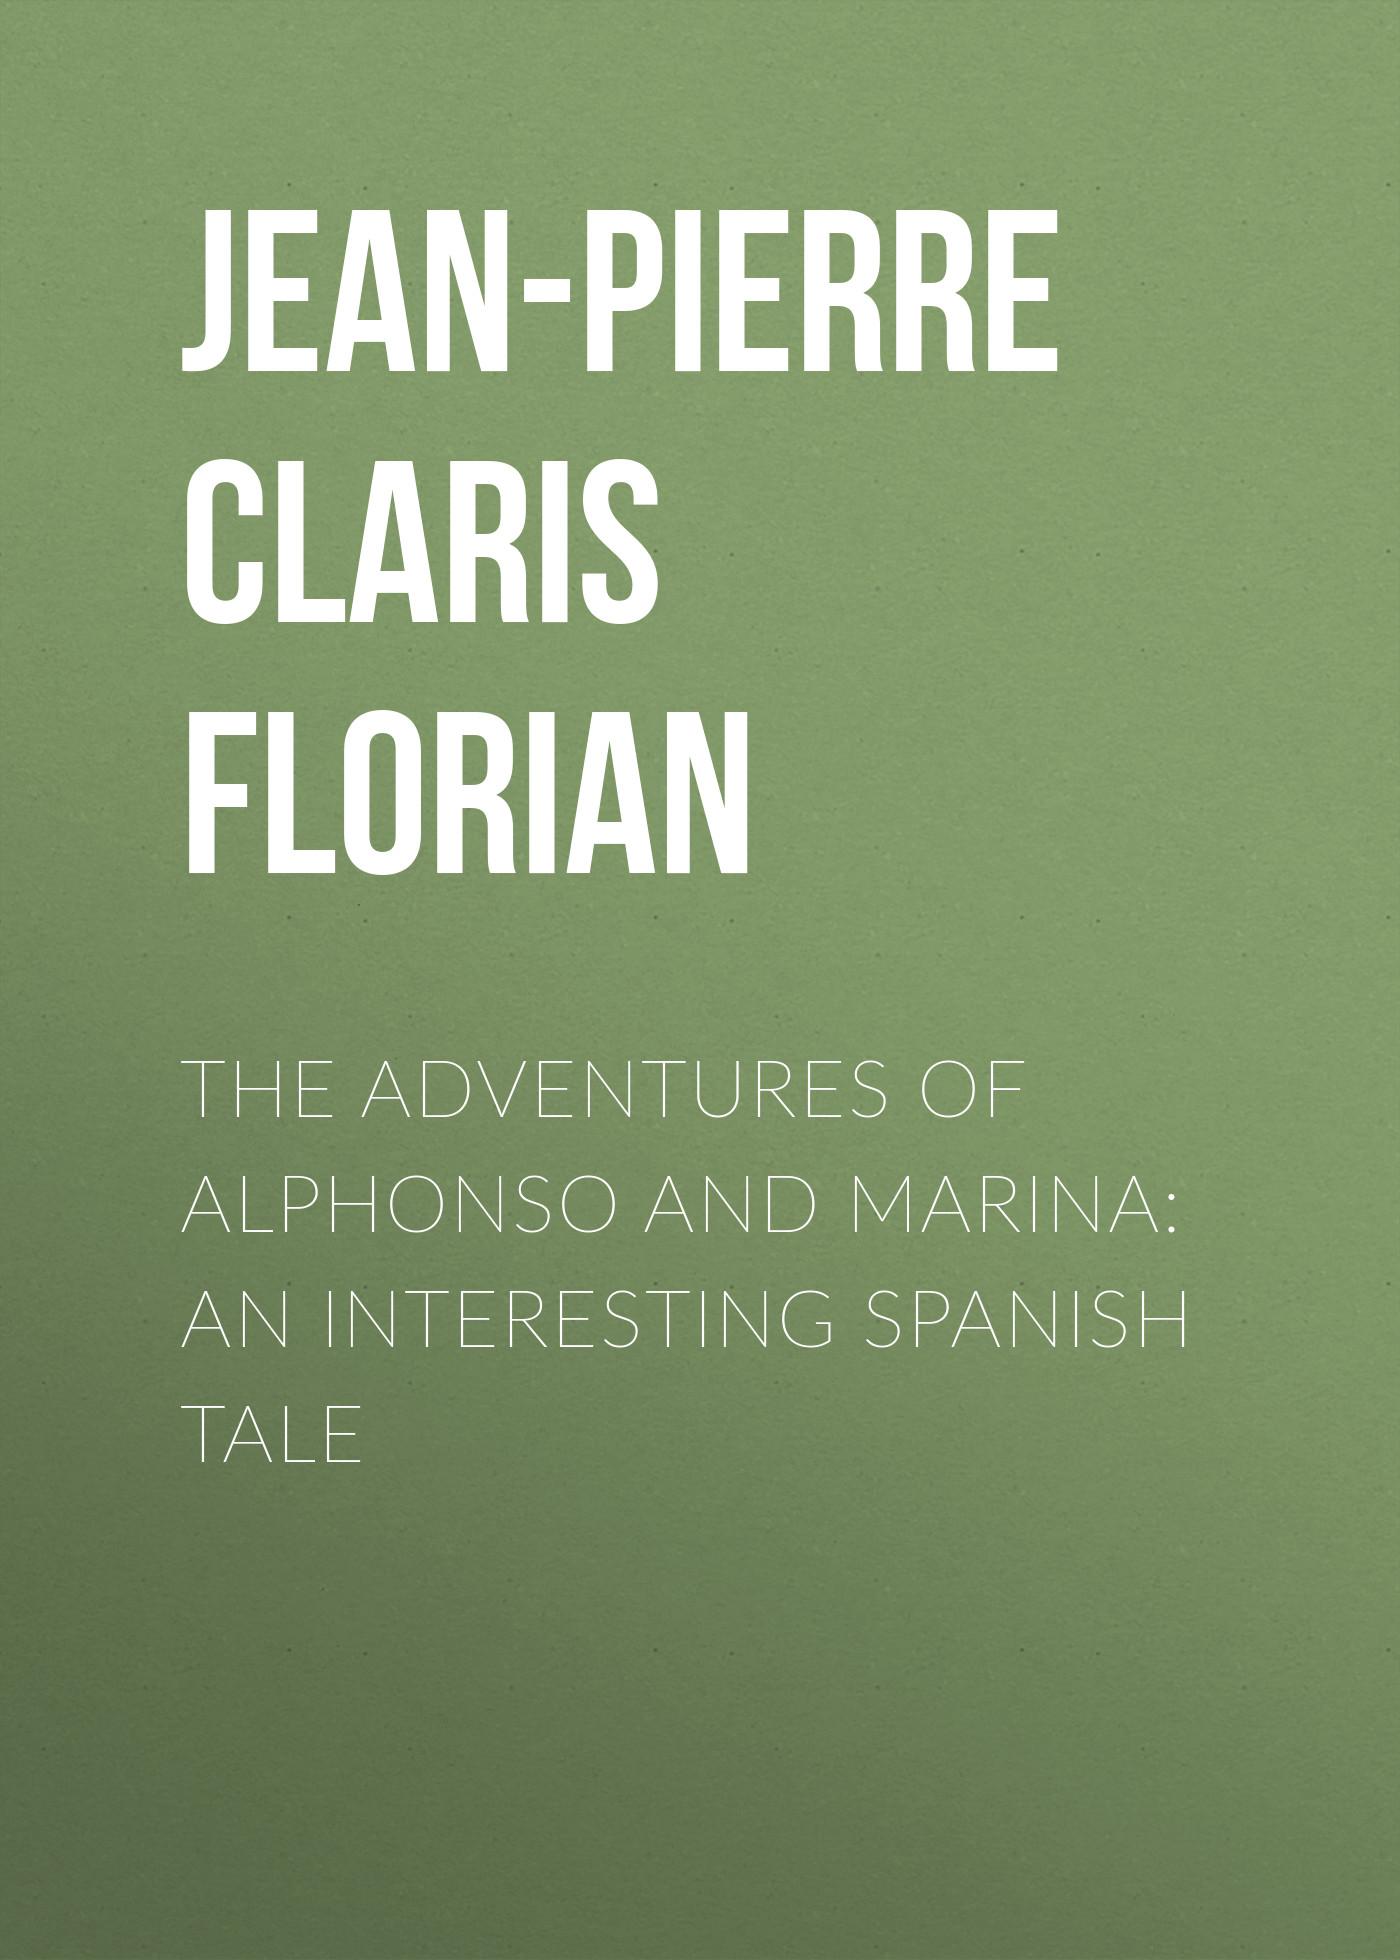 Jean-Pierre Claris de Florian The adventures of Alphonso and Marina: An Interesting Spanish Tale jean m burroughs children of destiny true adventures of three cultures